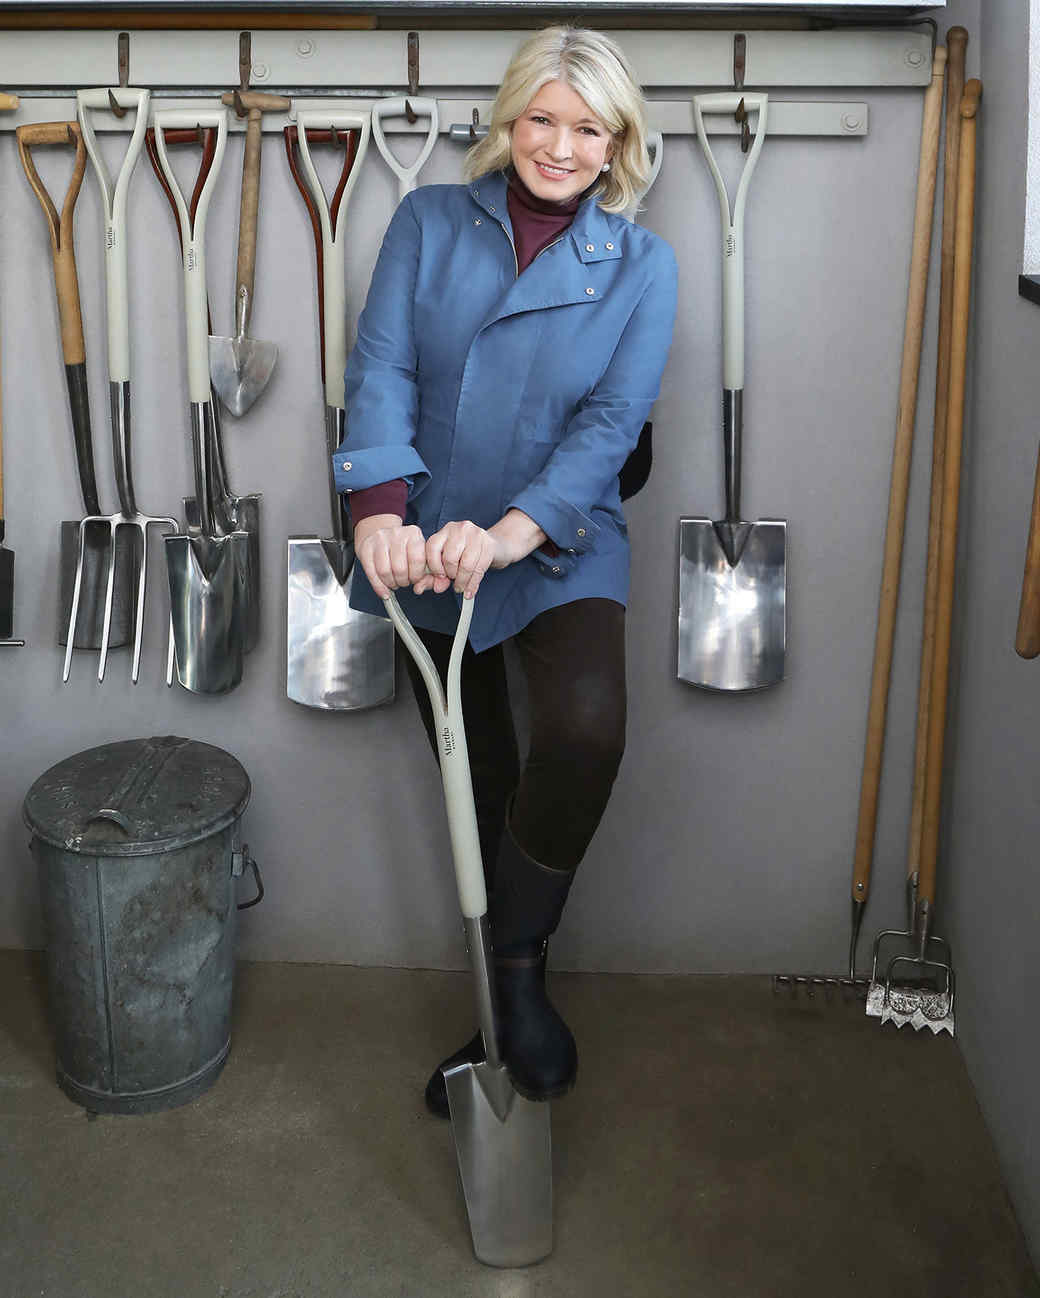 martha stewart standing with a shovel